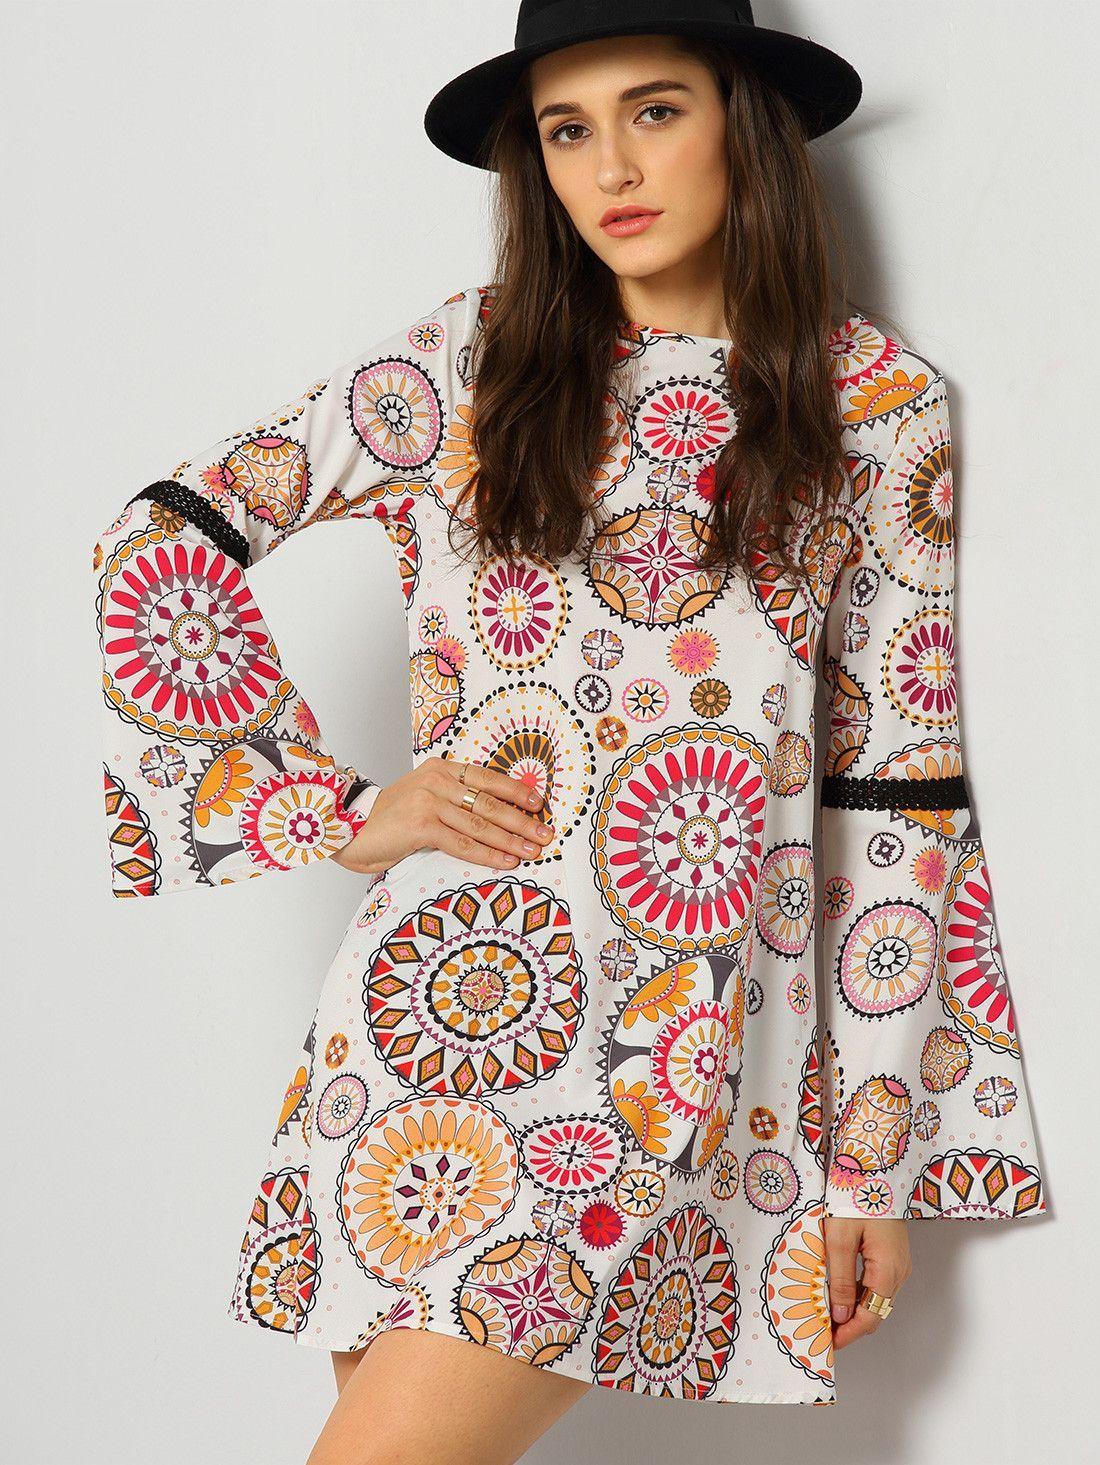 Multicolor long sleeve backless vintage print dress clothing